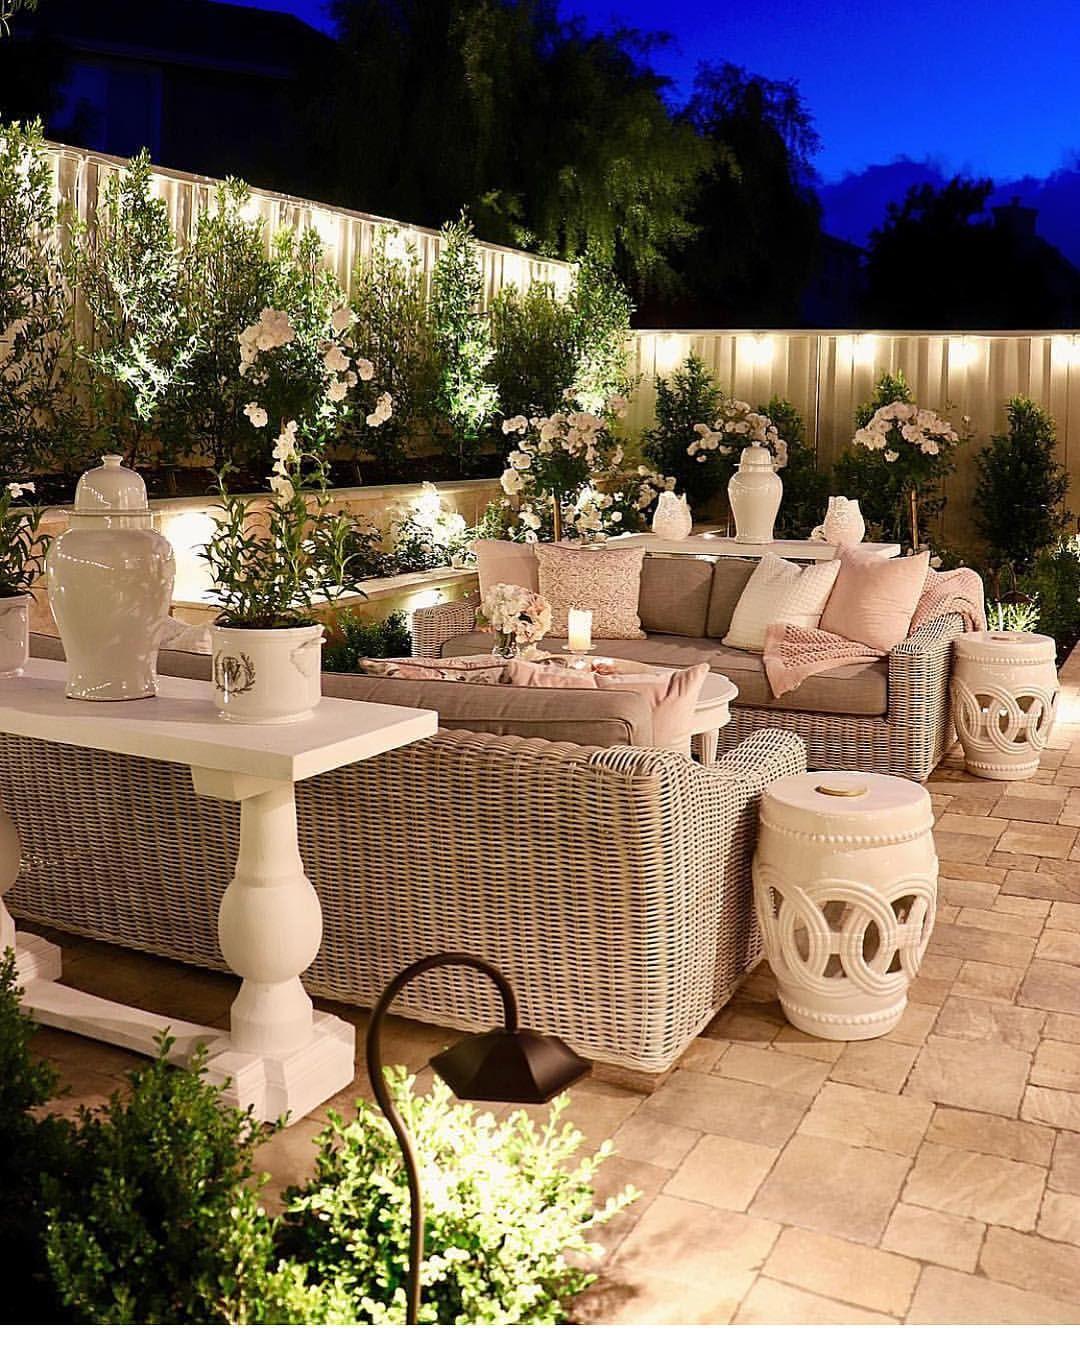 Brilliant backyard ideas diy patio #outdoor #backyard #backyardlandscaping #backyardgarden #smallbackyard